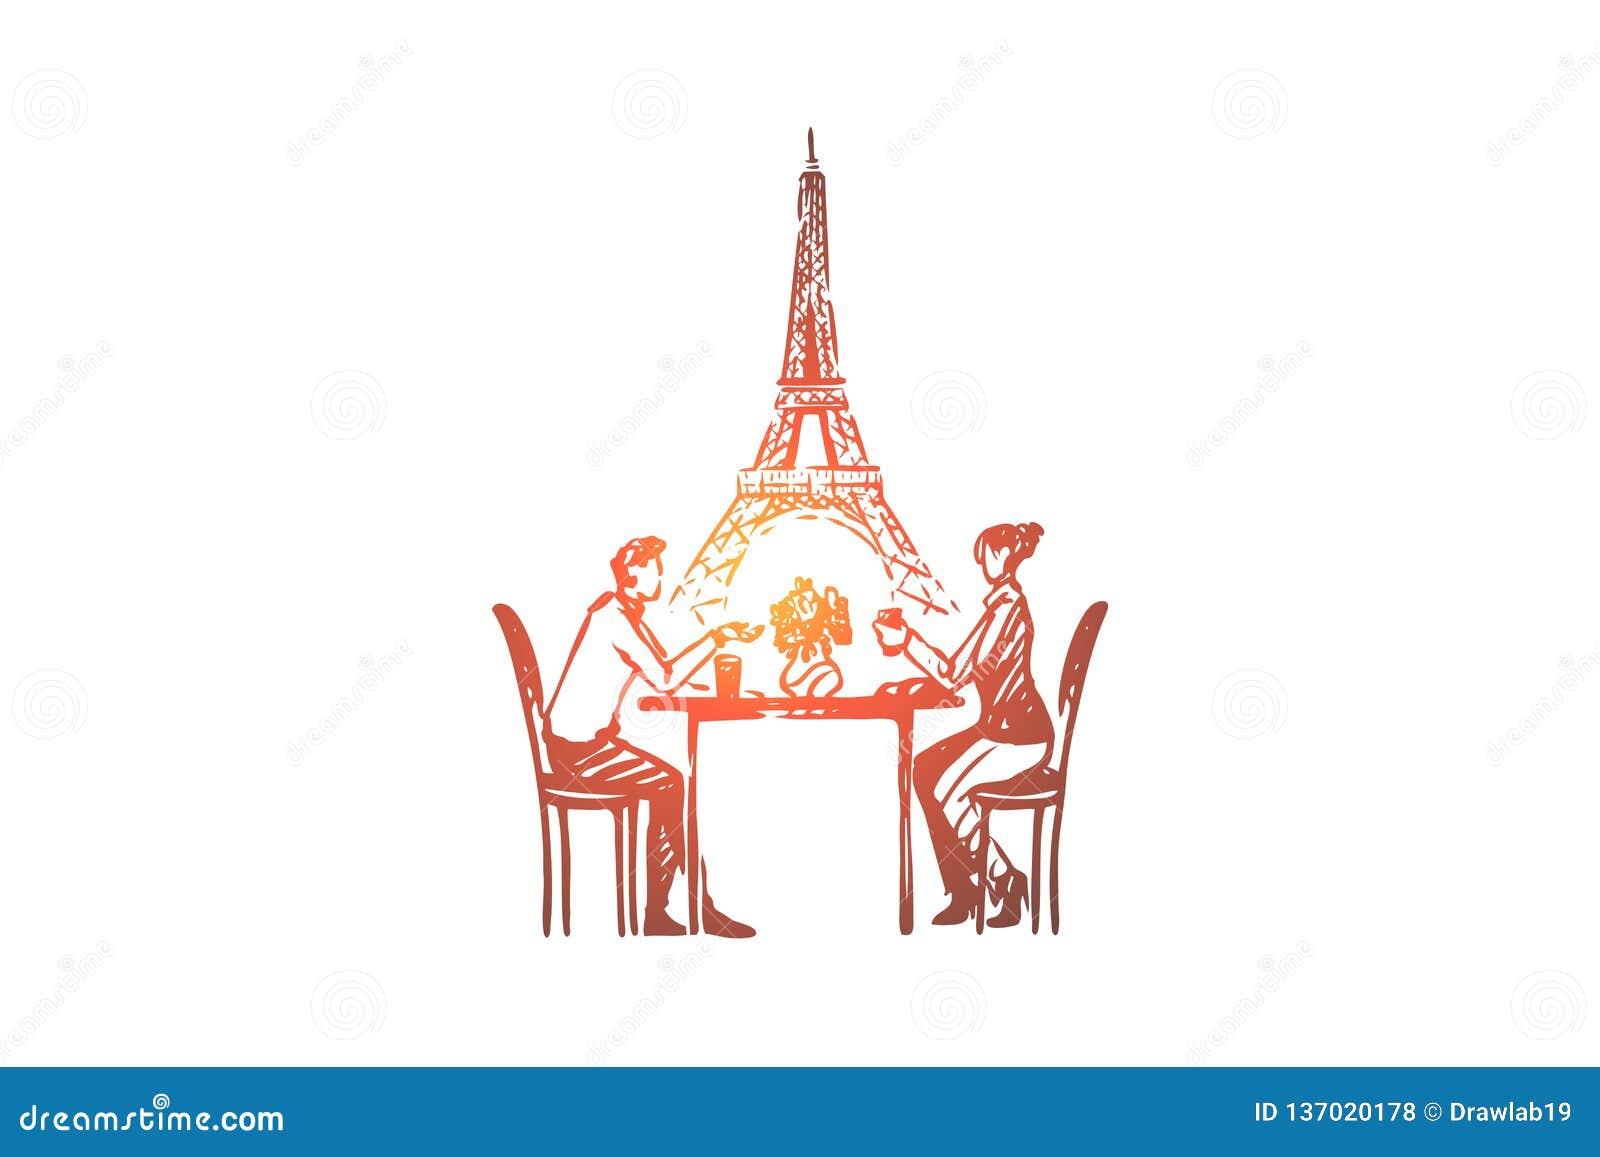 Couple, Paris, love, romance, feelings concept. Hand drawn isolated vector.